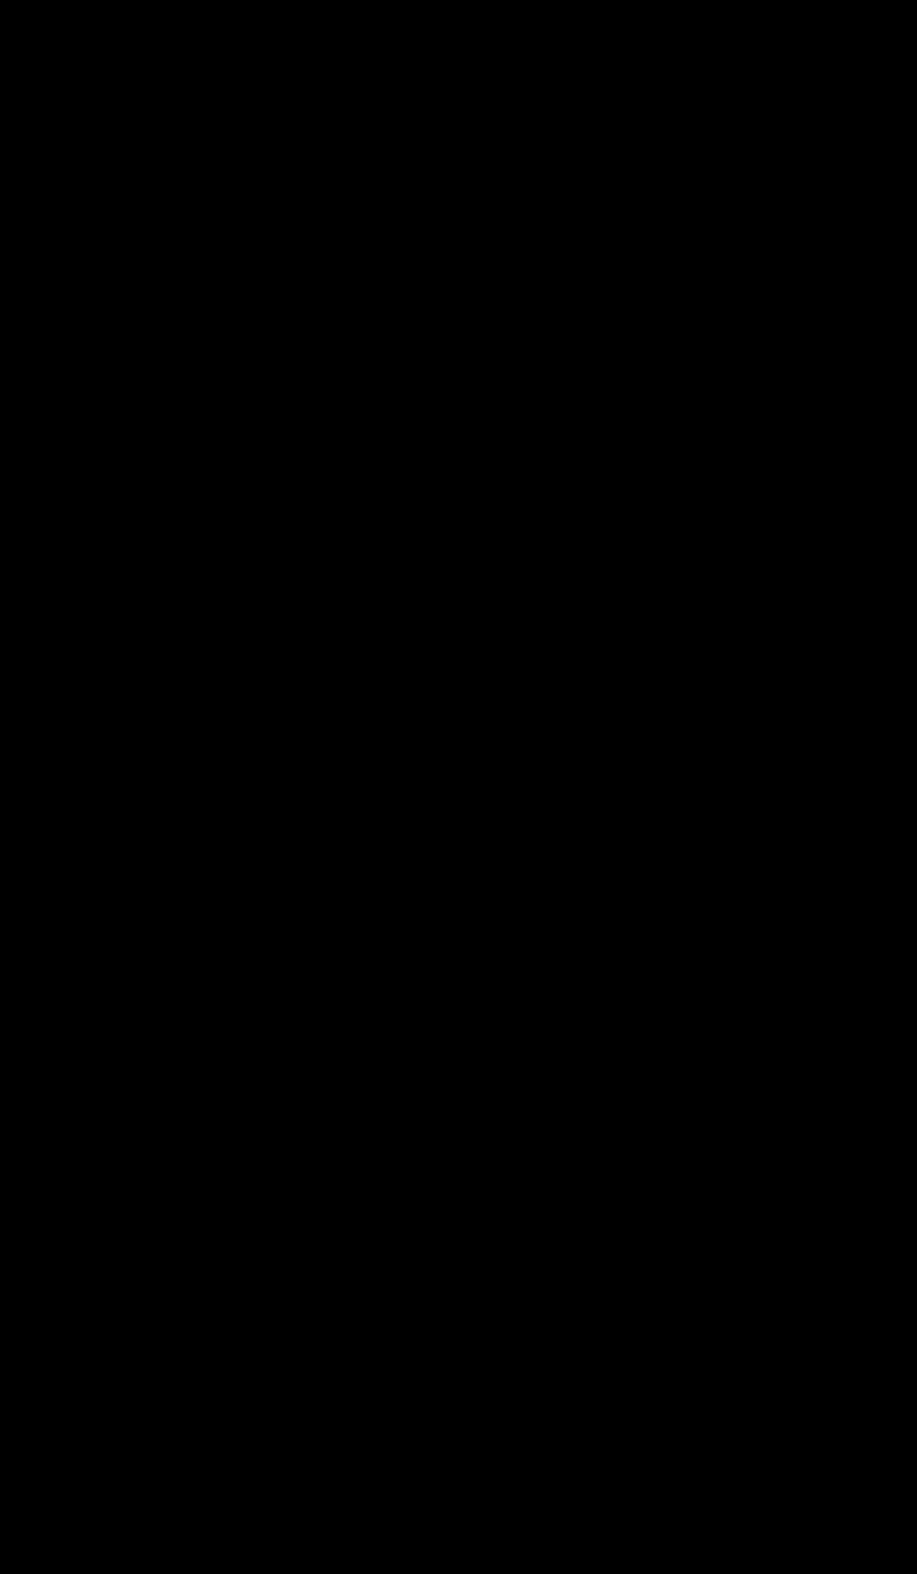 struktura-polovogo-chlena